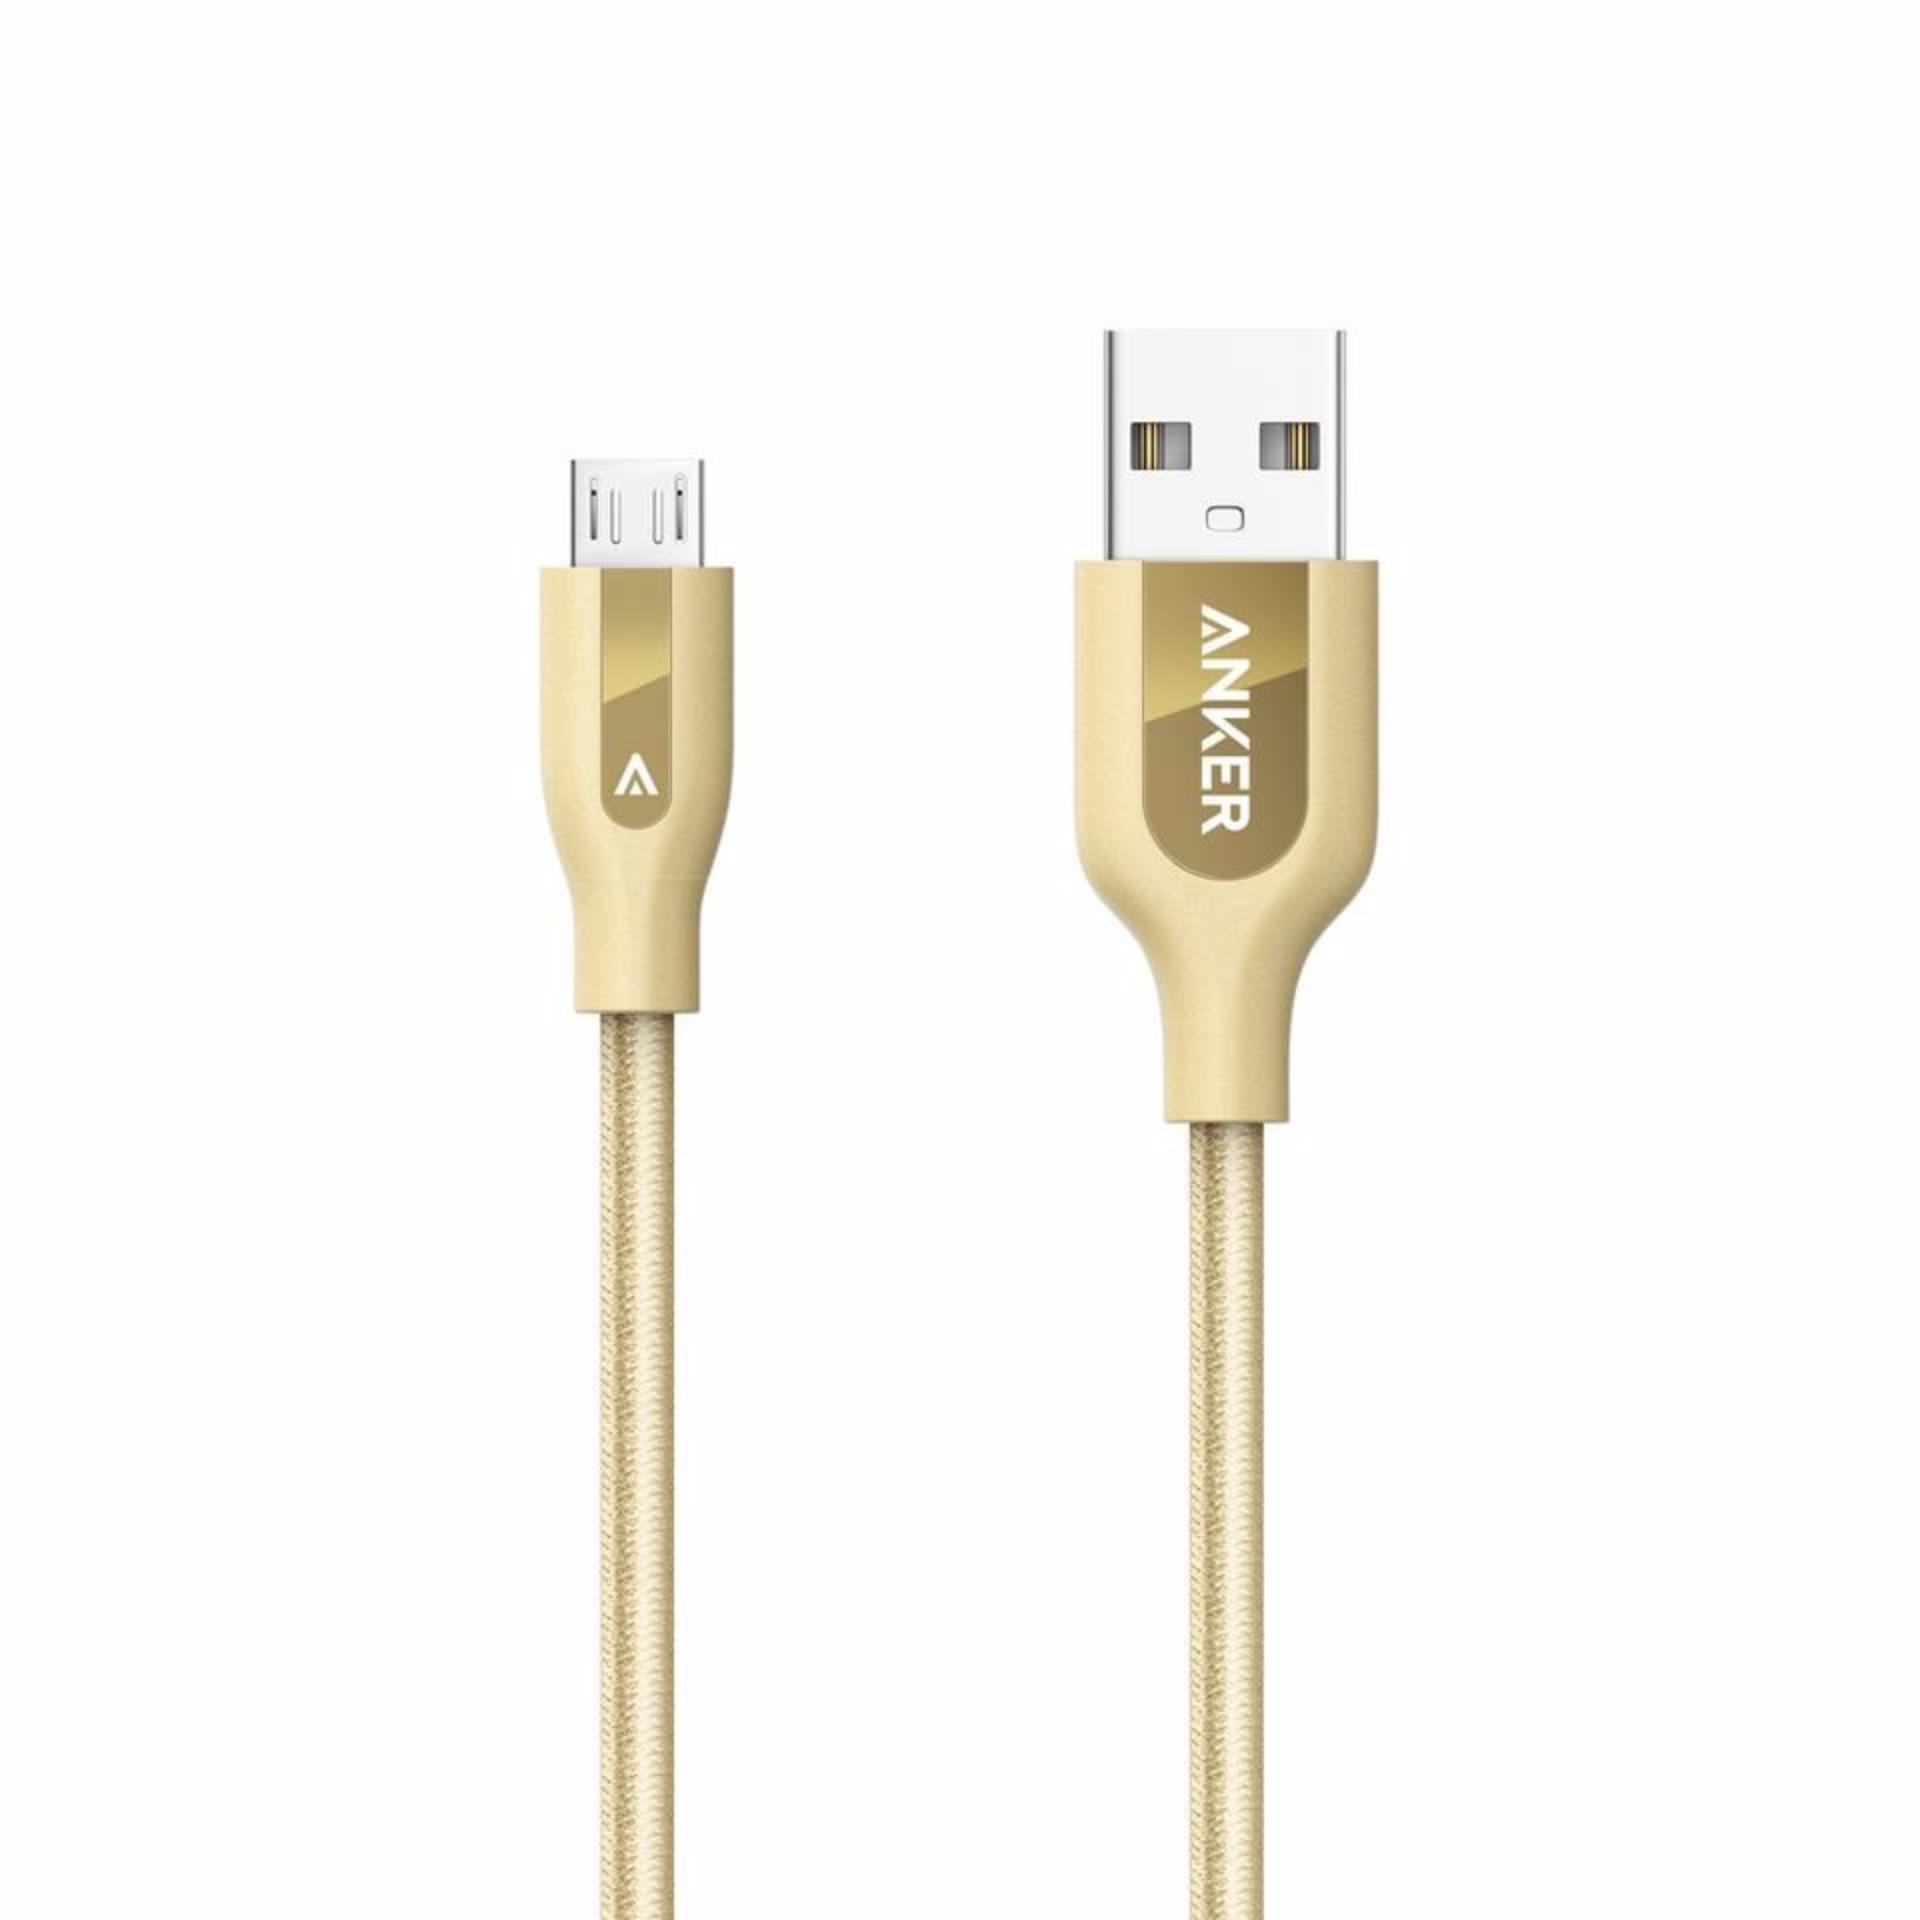 Cáp Micro-USB Anker PowerLine+ 0.9m